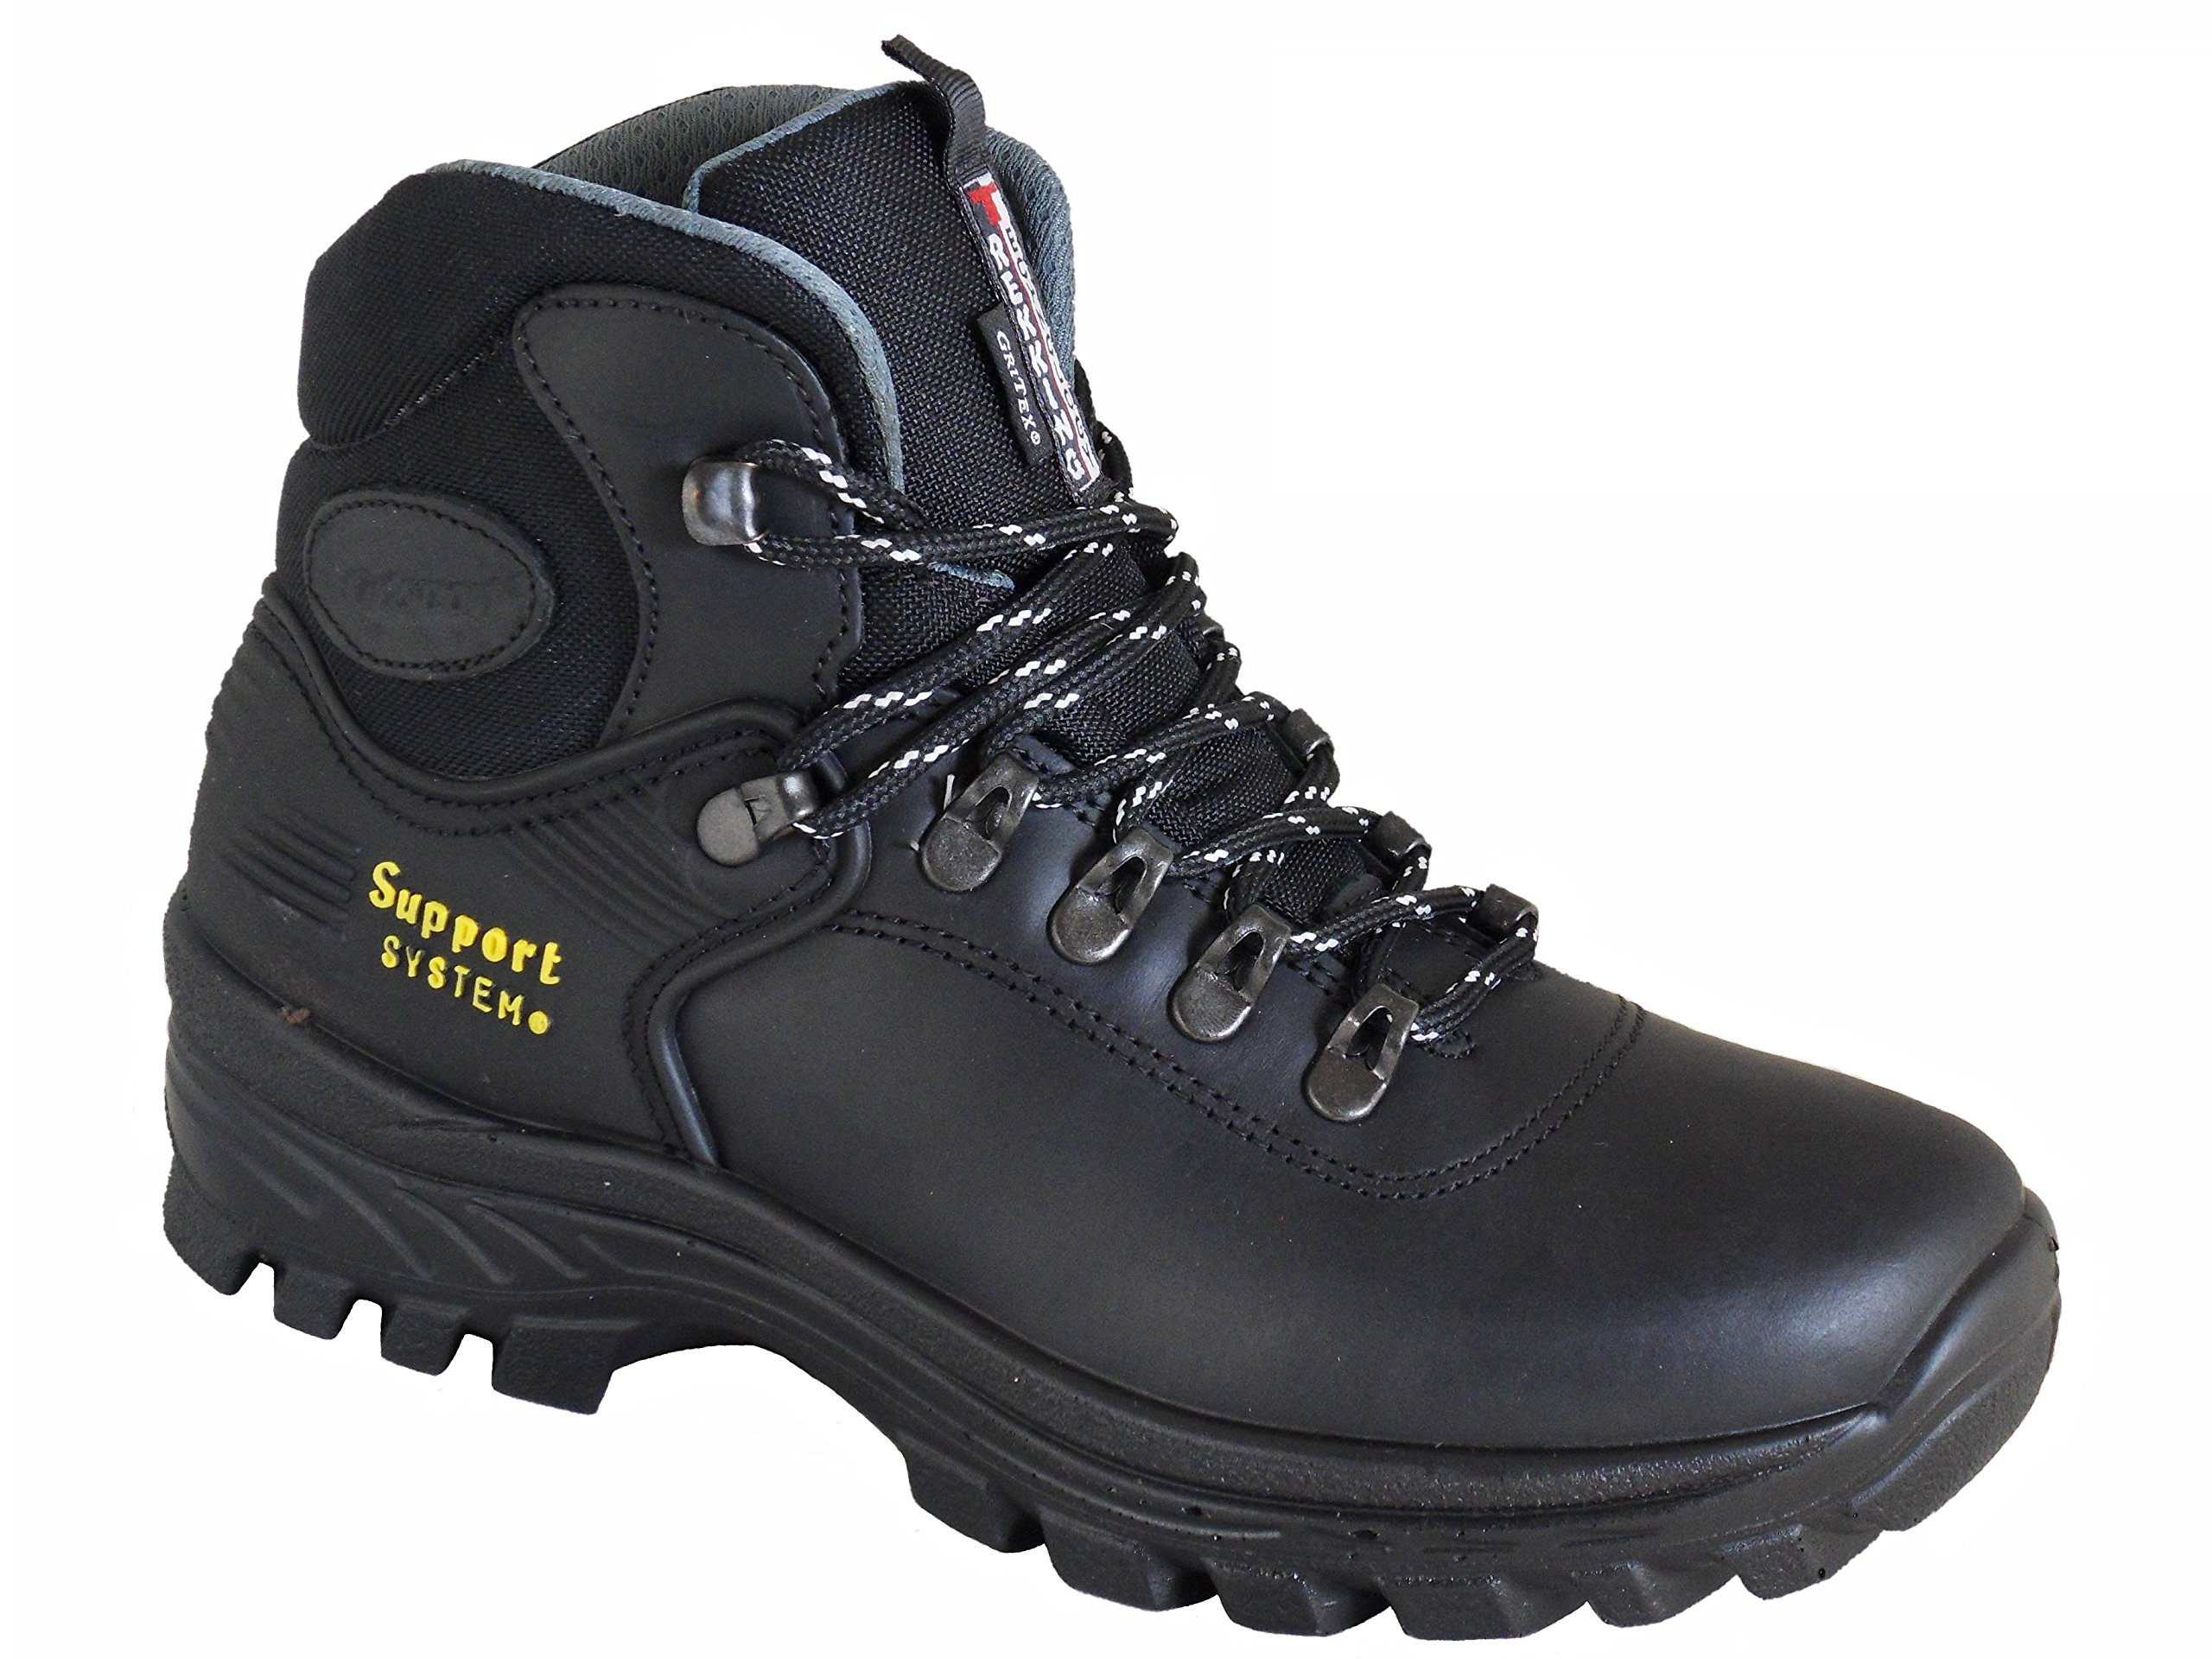 91pltF7Jg5L - Grisport Explorer Ladies Lightweight Waterproof Walking Boots Black